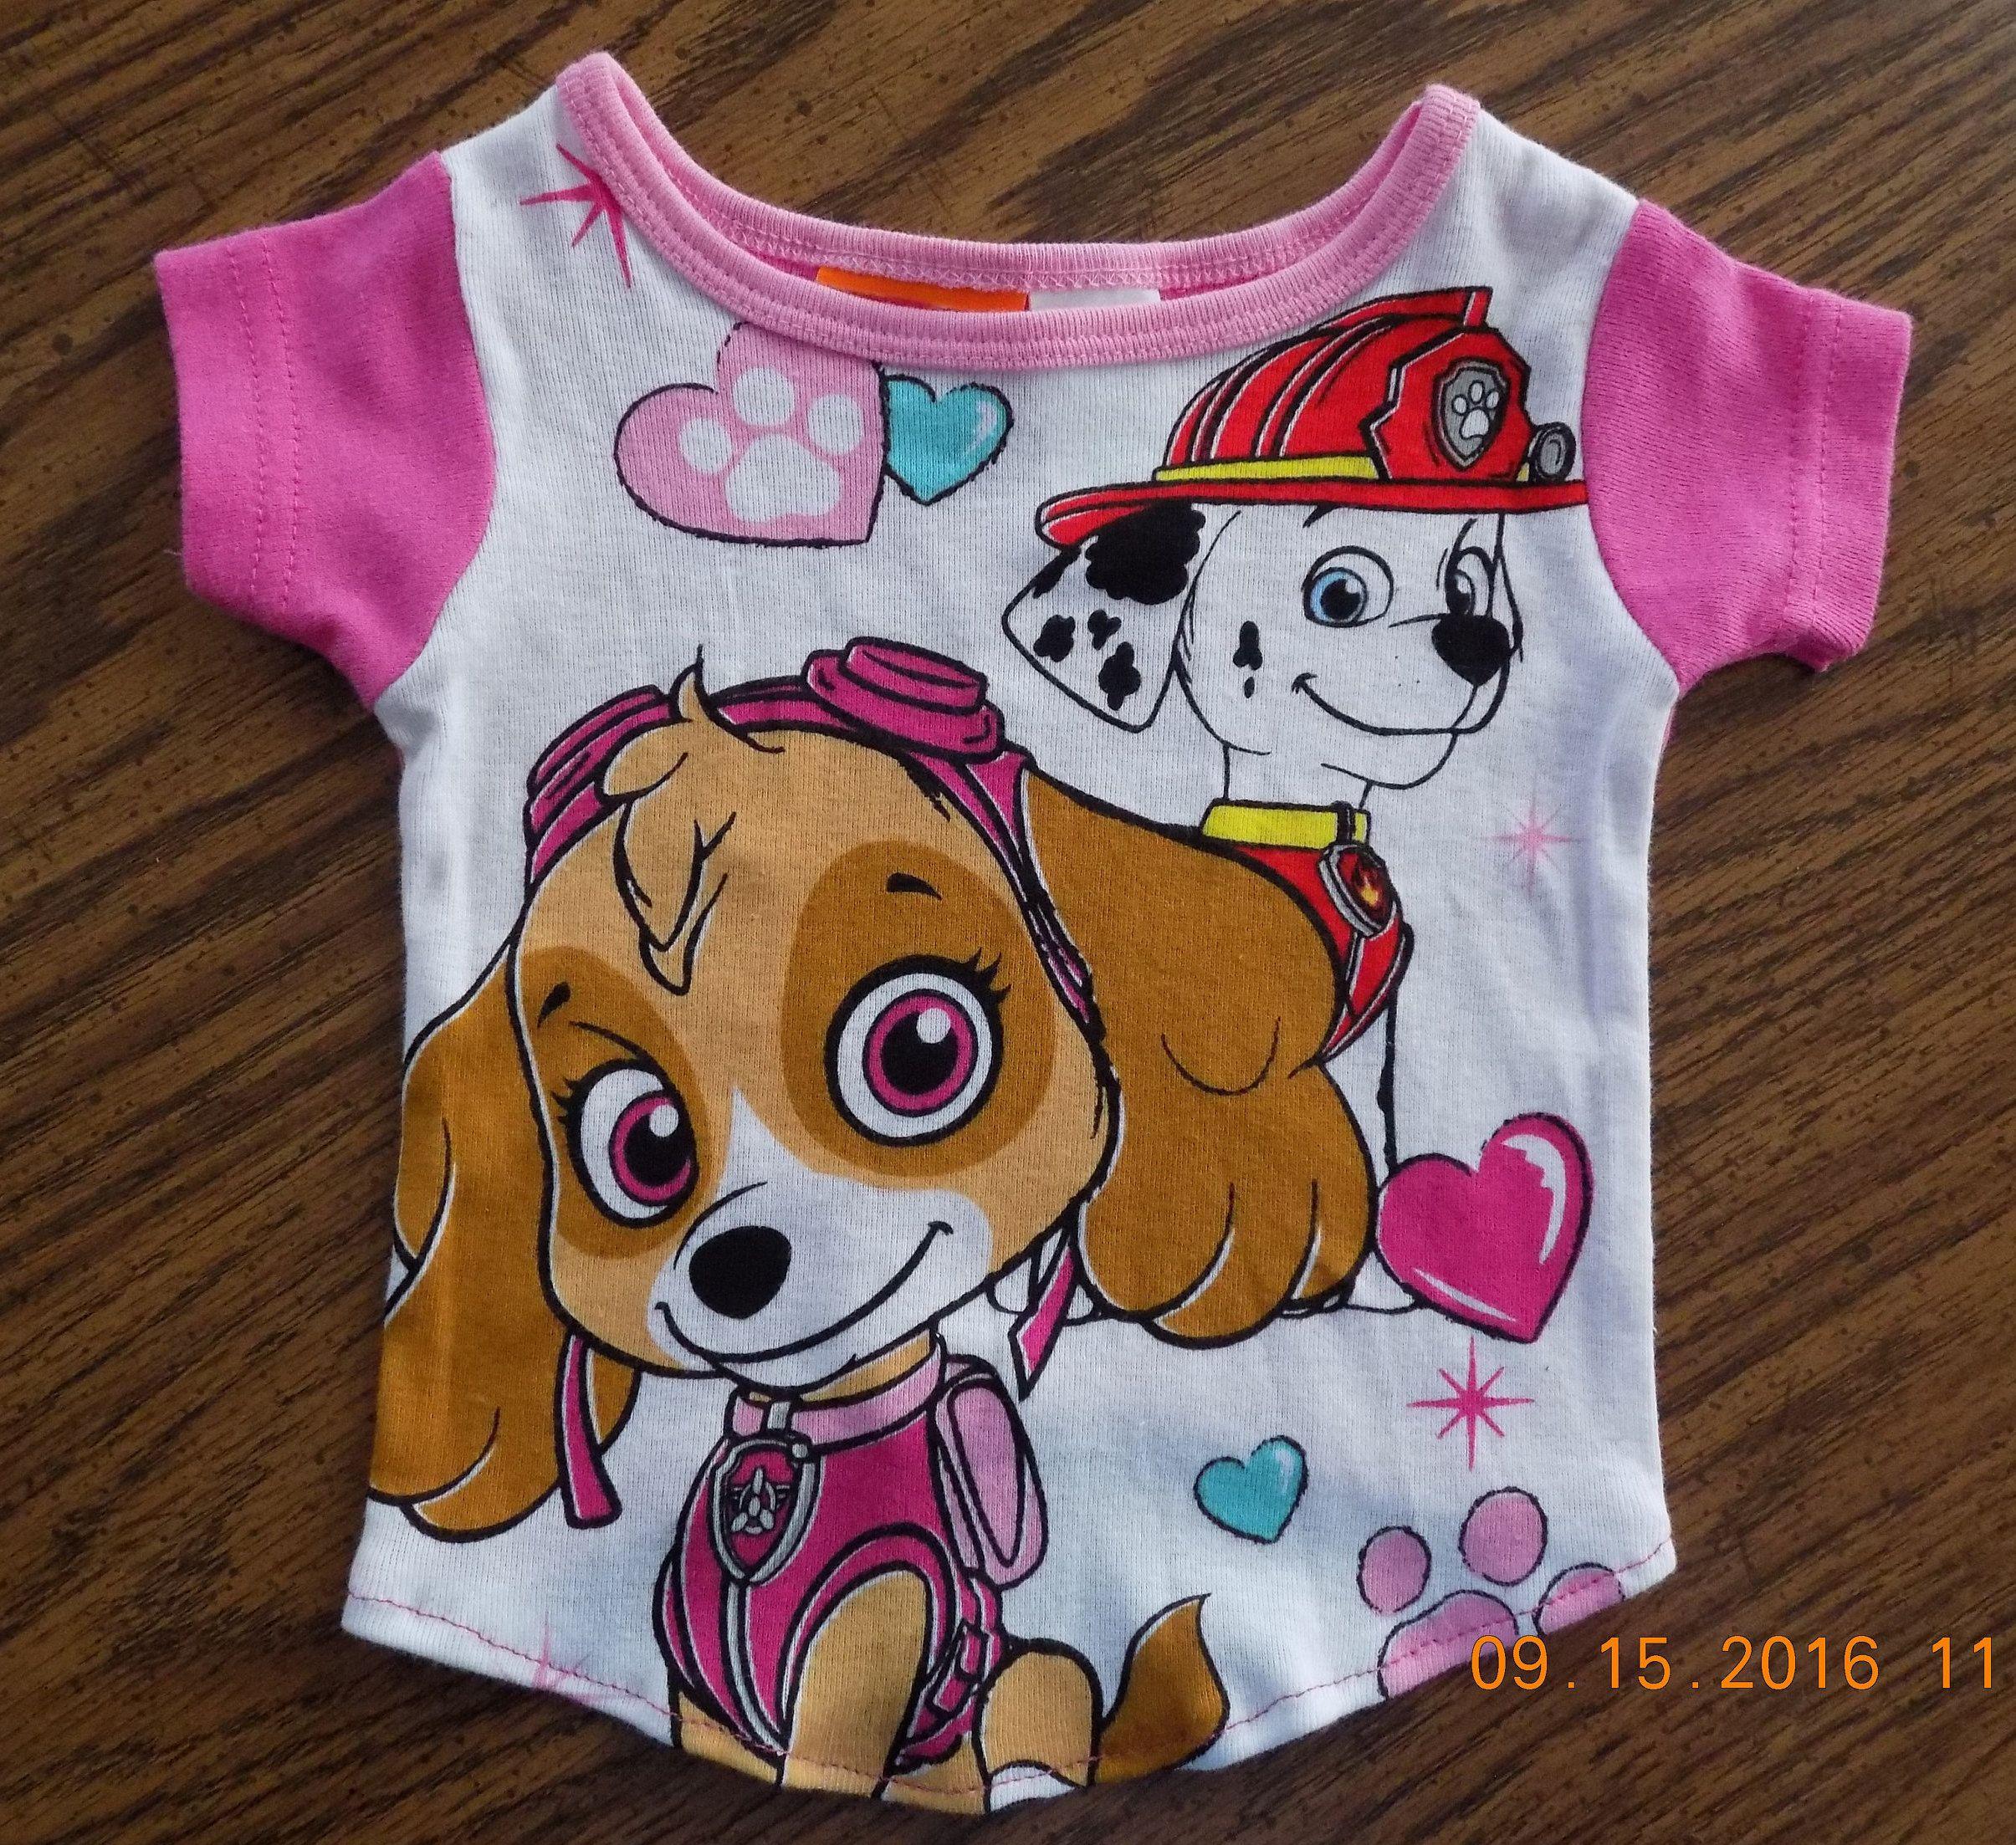 a7c04c0d3bb0 Paw Patrol Shirt//Dog Shirt//Dog Clothing//Shirt for Dogs//Dog Accessories//Cute  Dog Shirts//FREE SHIPPING